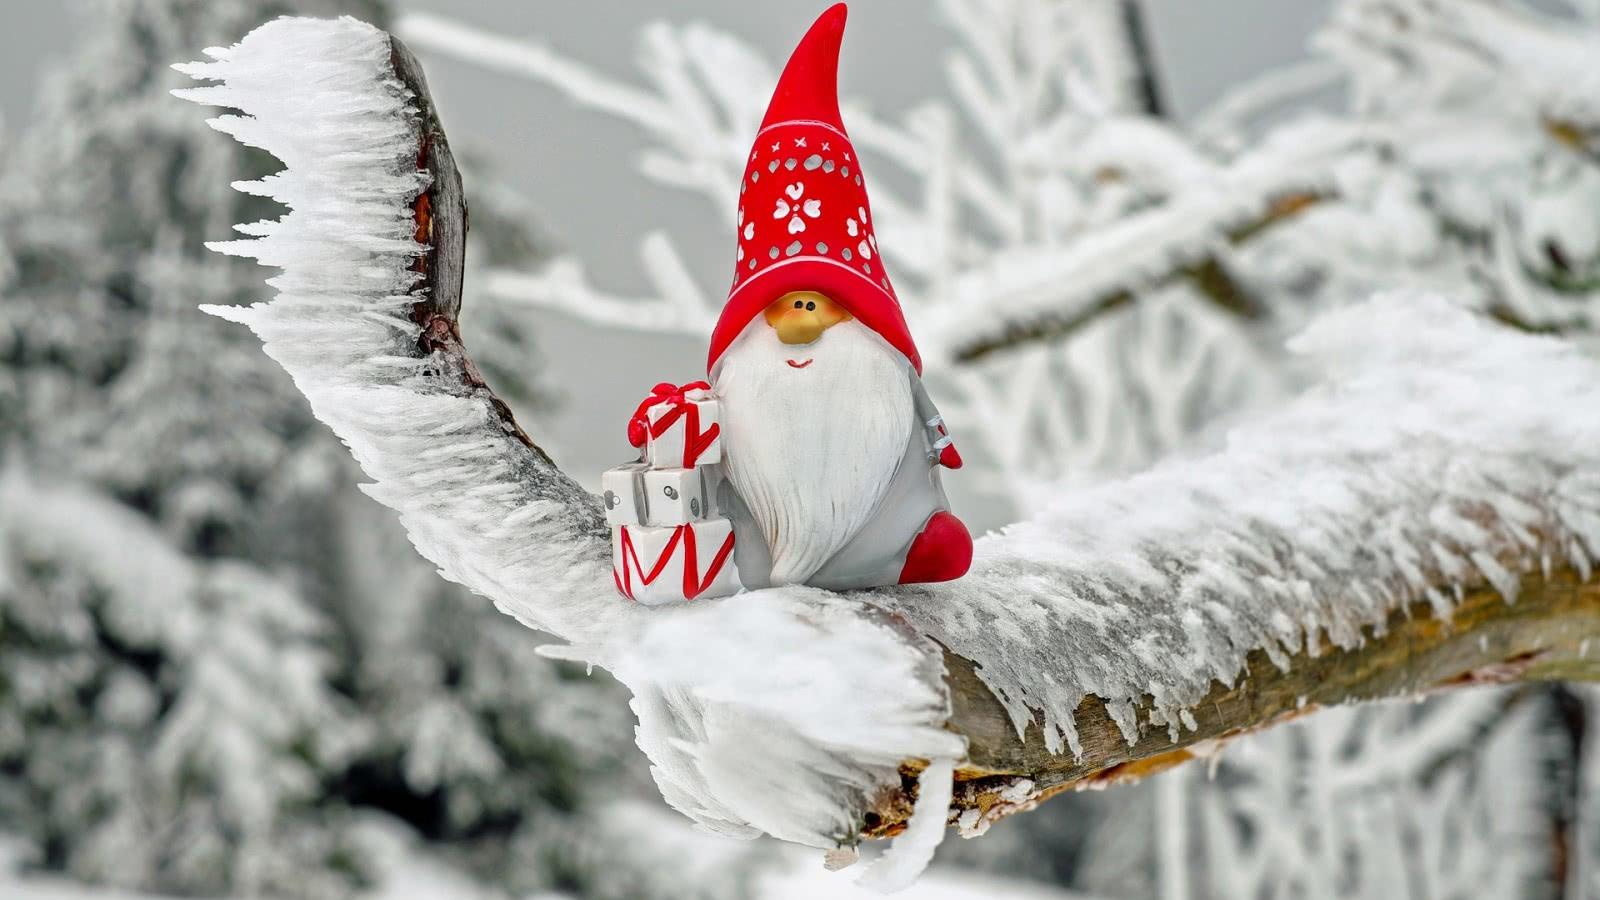 La Petite Gaillarde : La fugue du Père Noël